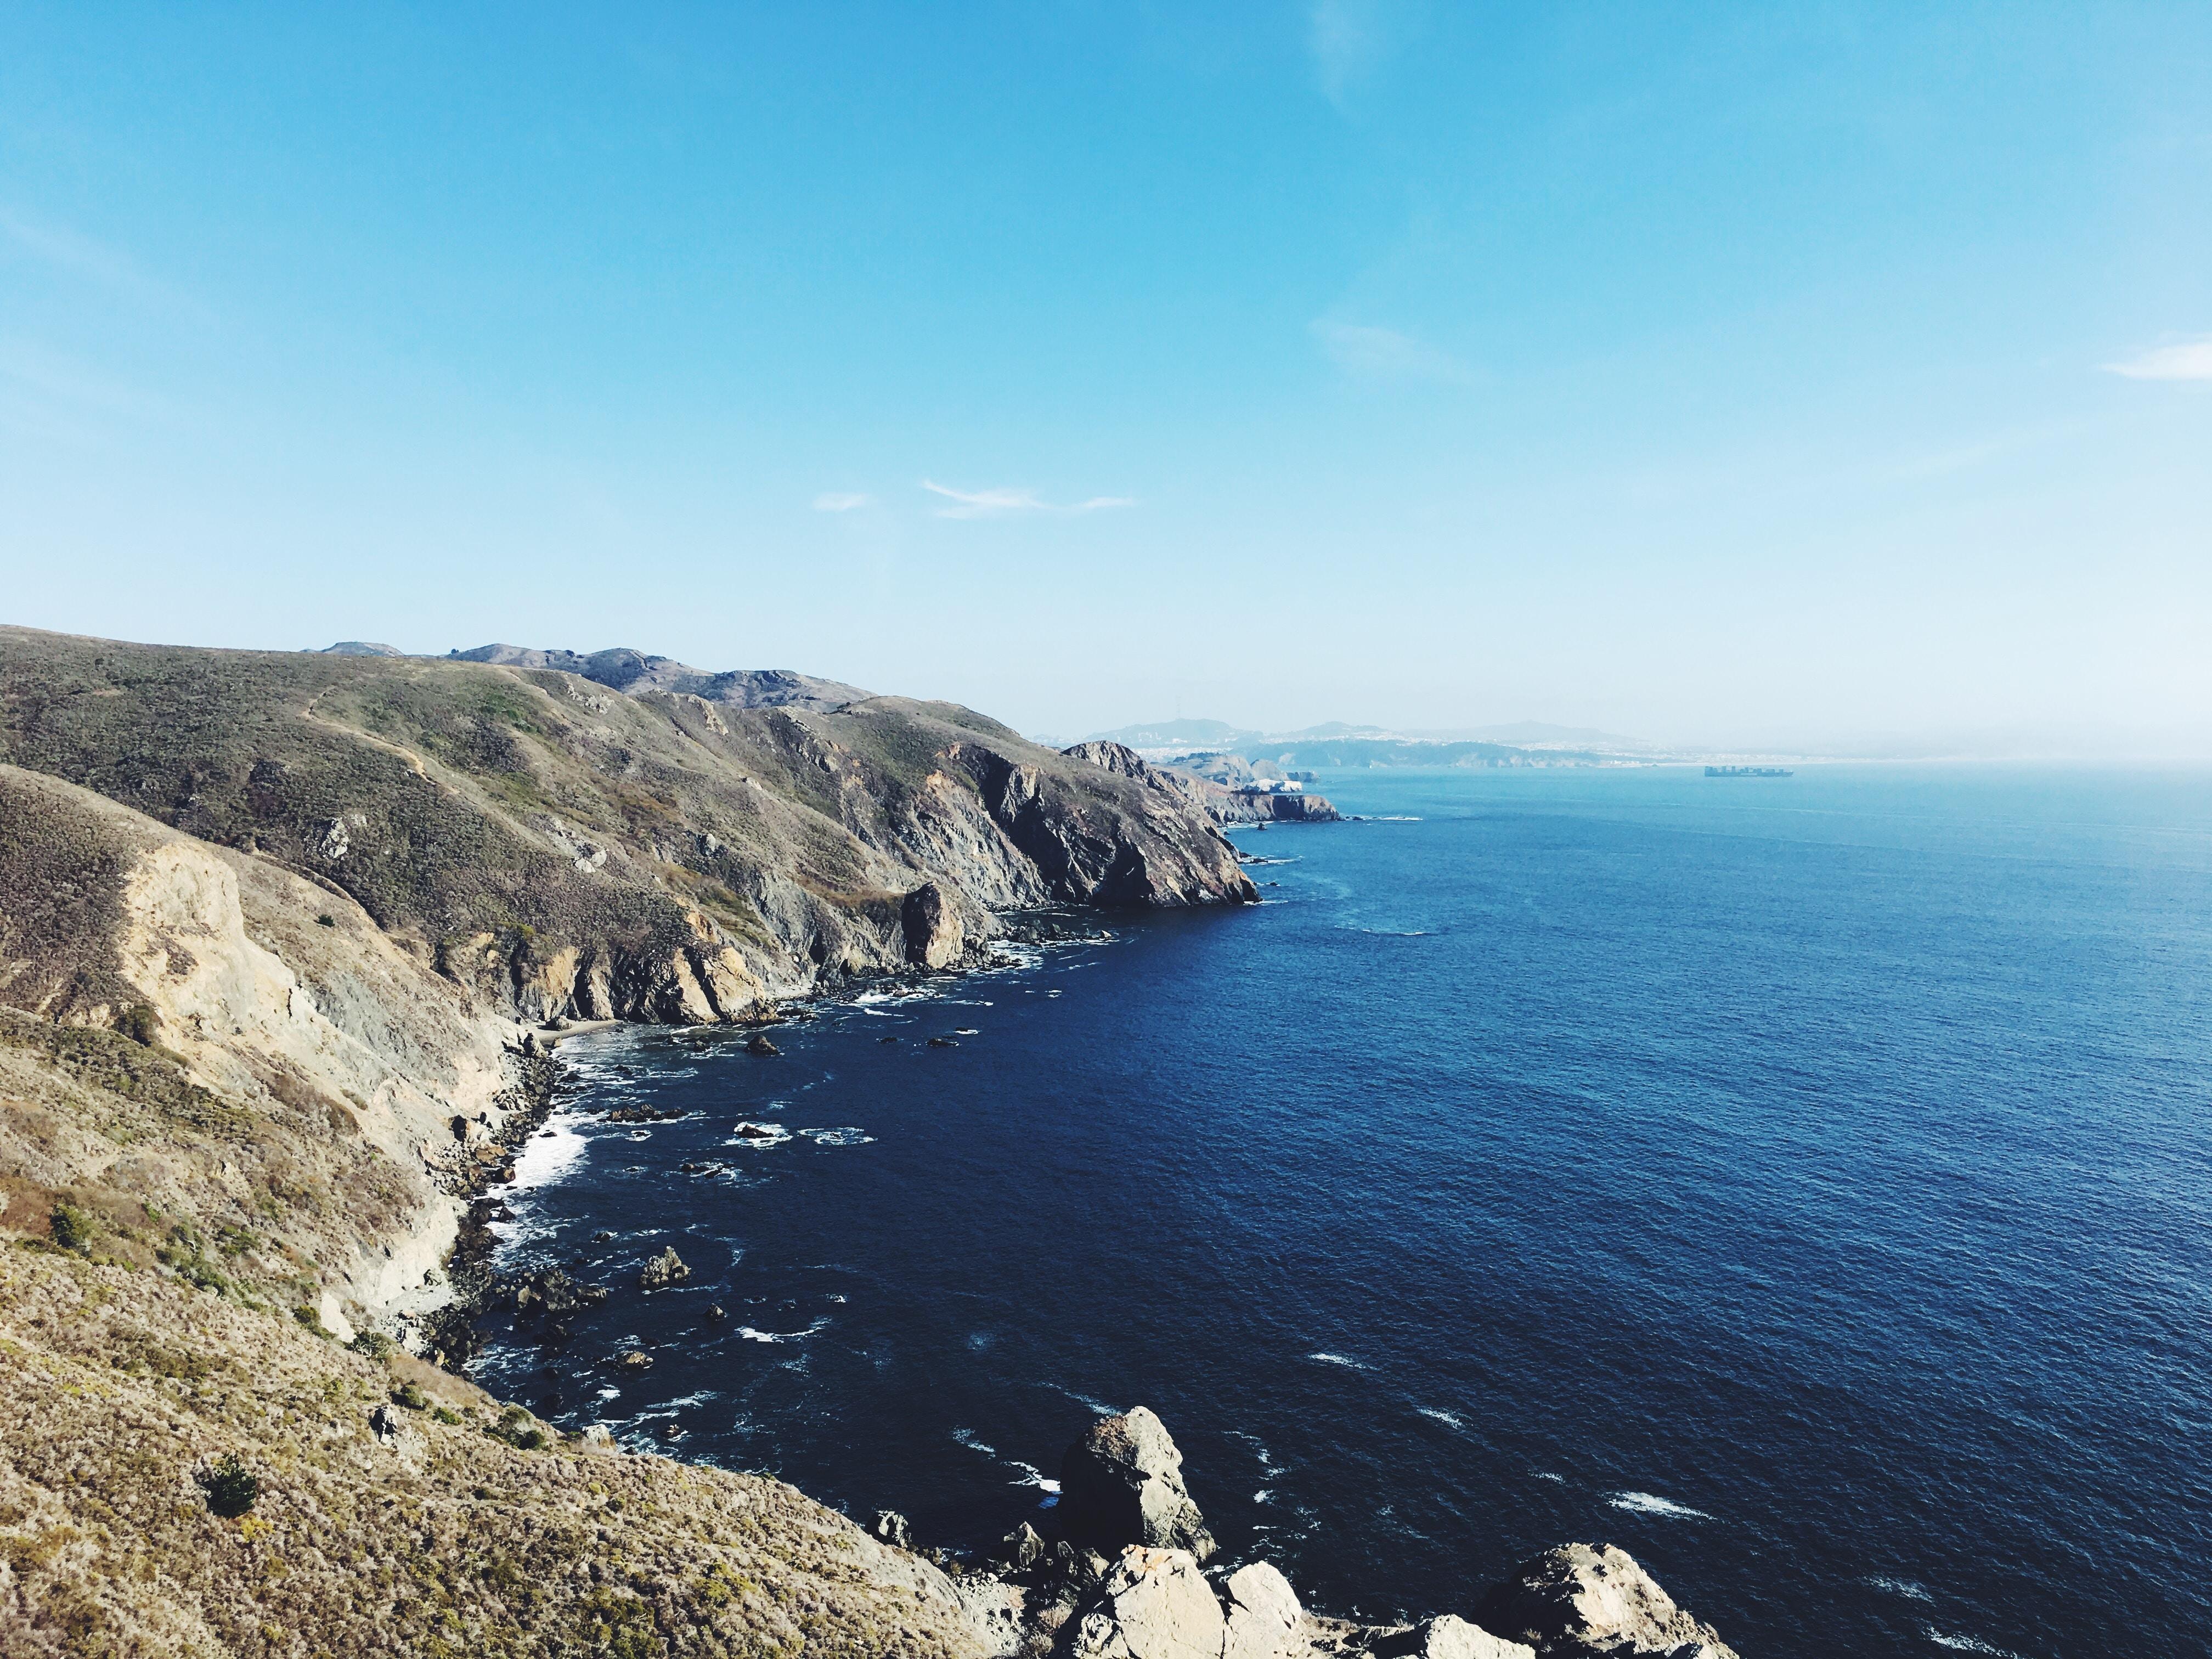 Bluffs on the coastline near a blue ocean